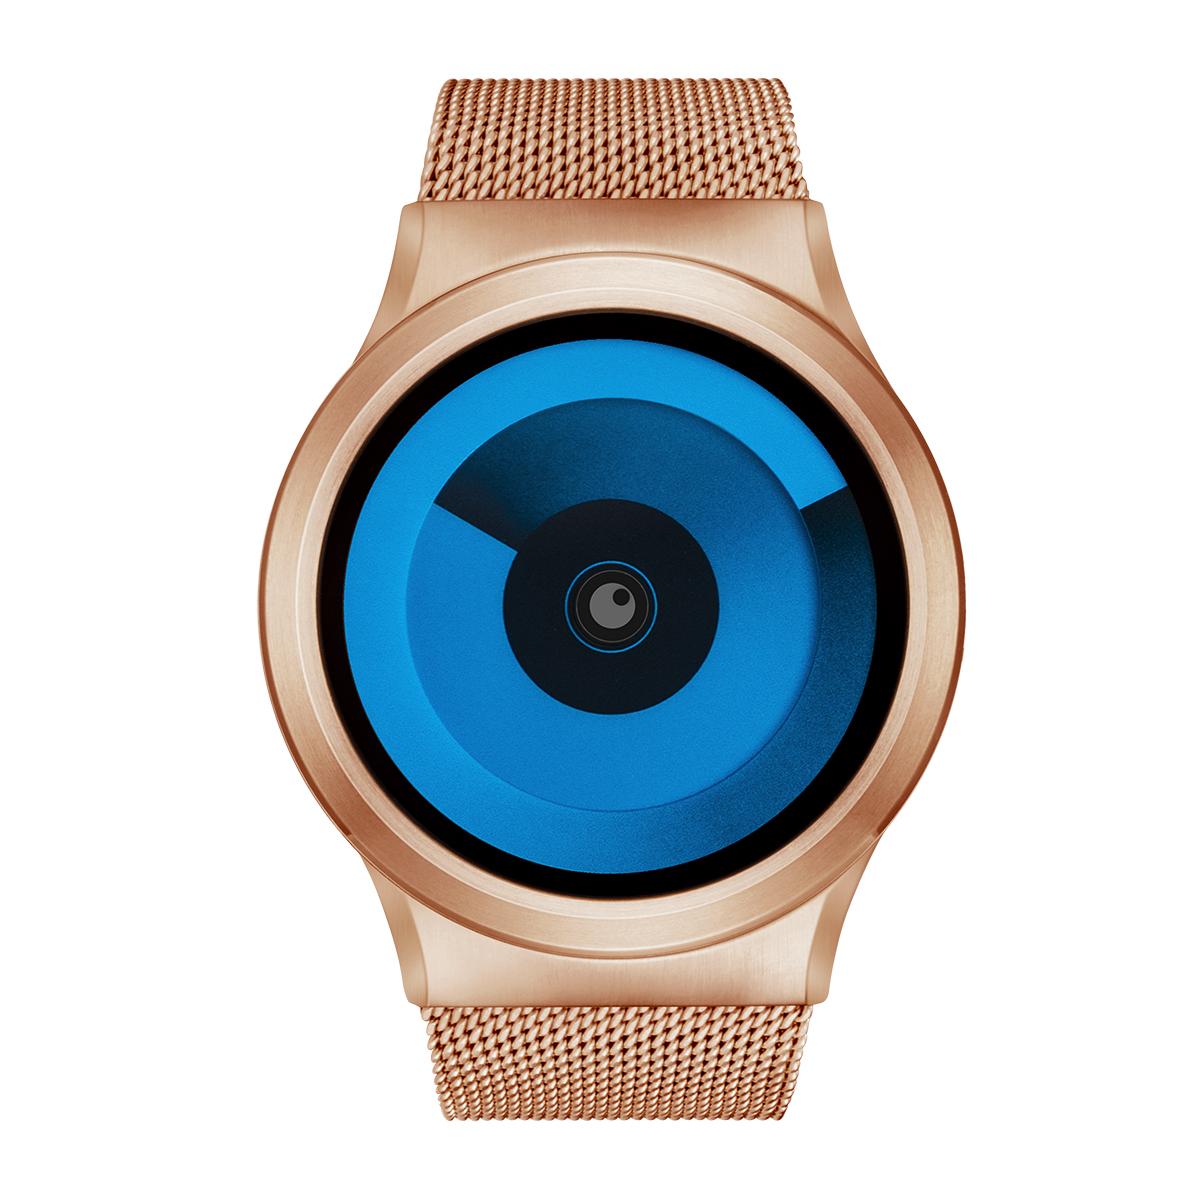 ZEROO SPIRAL GALAXY ゼロ 電池式クォーツ 腕時計 [W06015B05SM05] ブルー デザインウォッチ ペア用 メンズ レディース ユニセックス おしゃれ時計 デザイナーズ